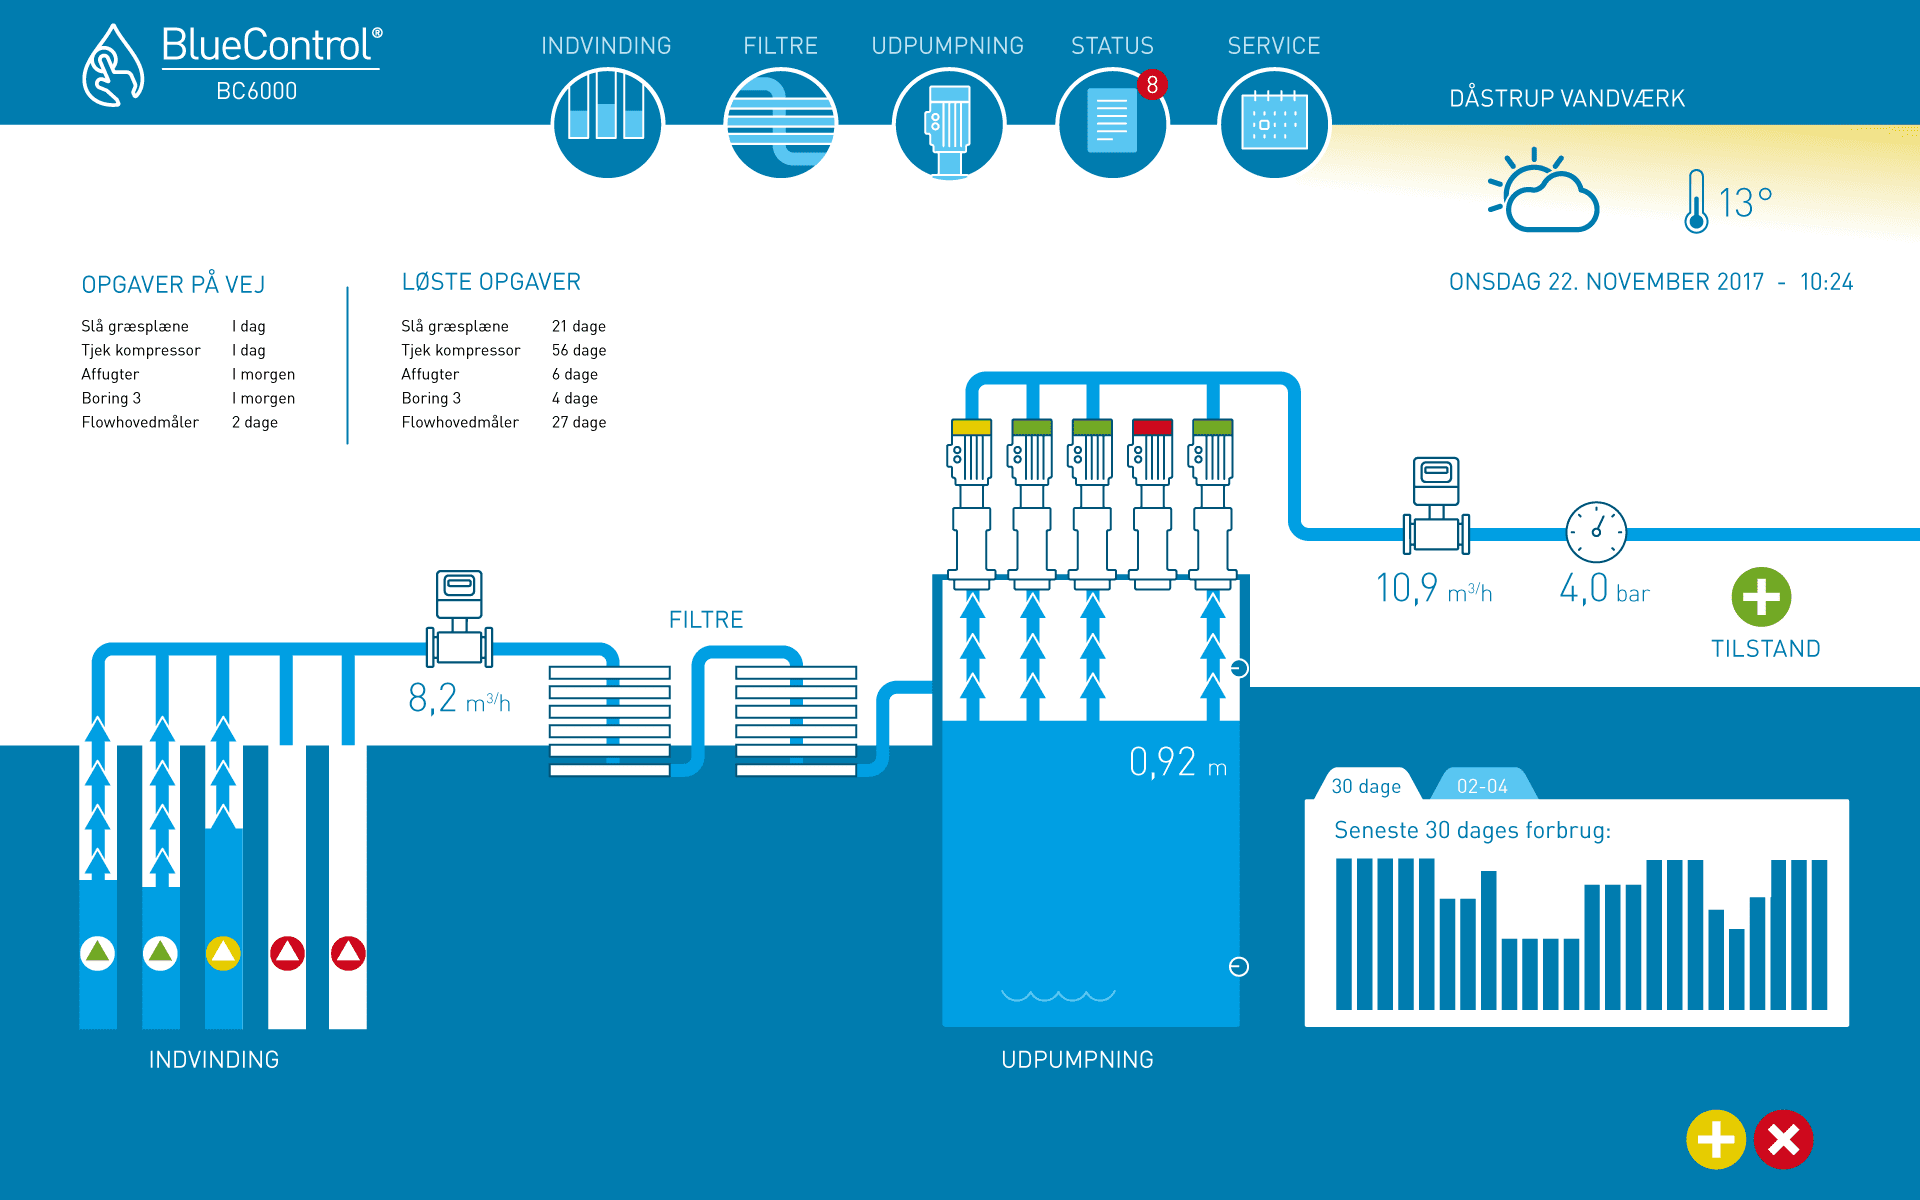 bluecontrol